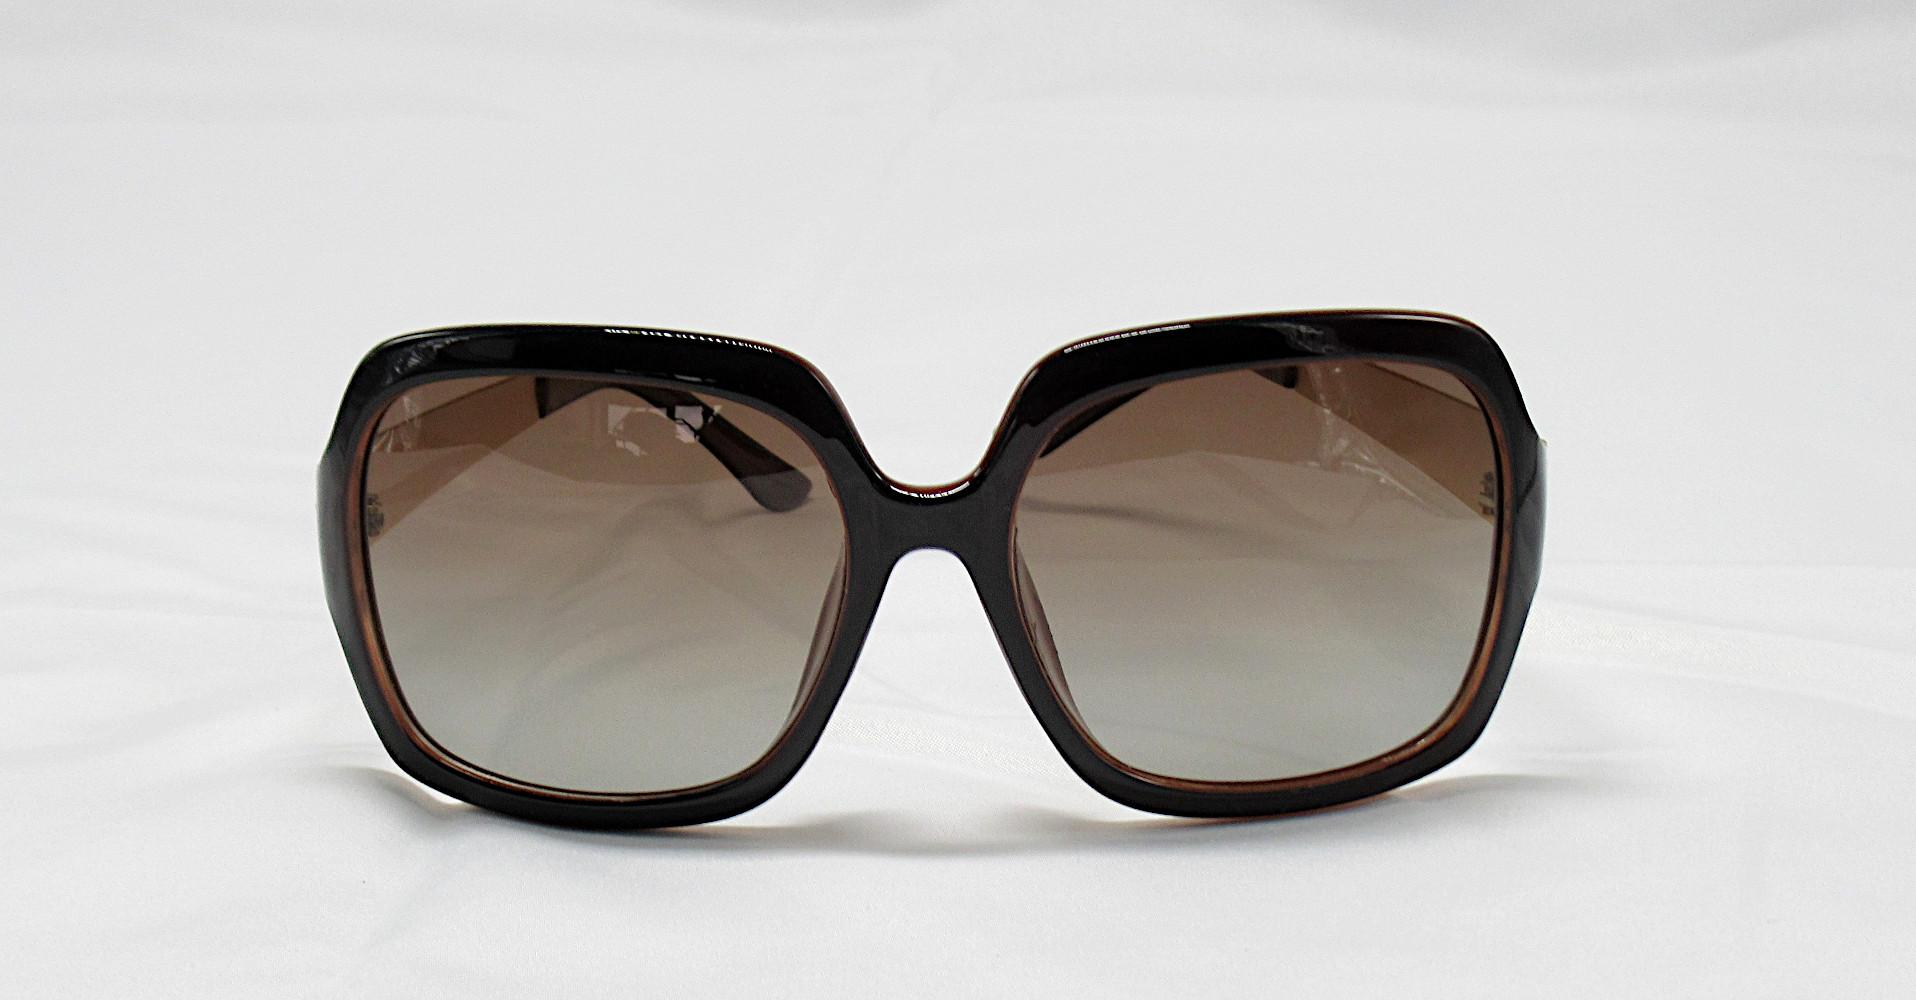 RJ-114_Polarized Sunglasses_brown-gold-P2232-2